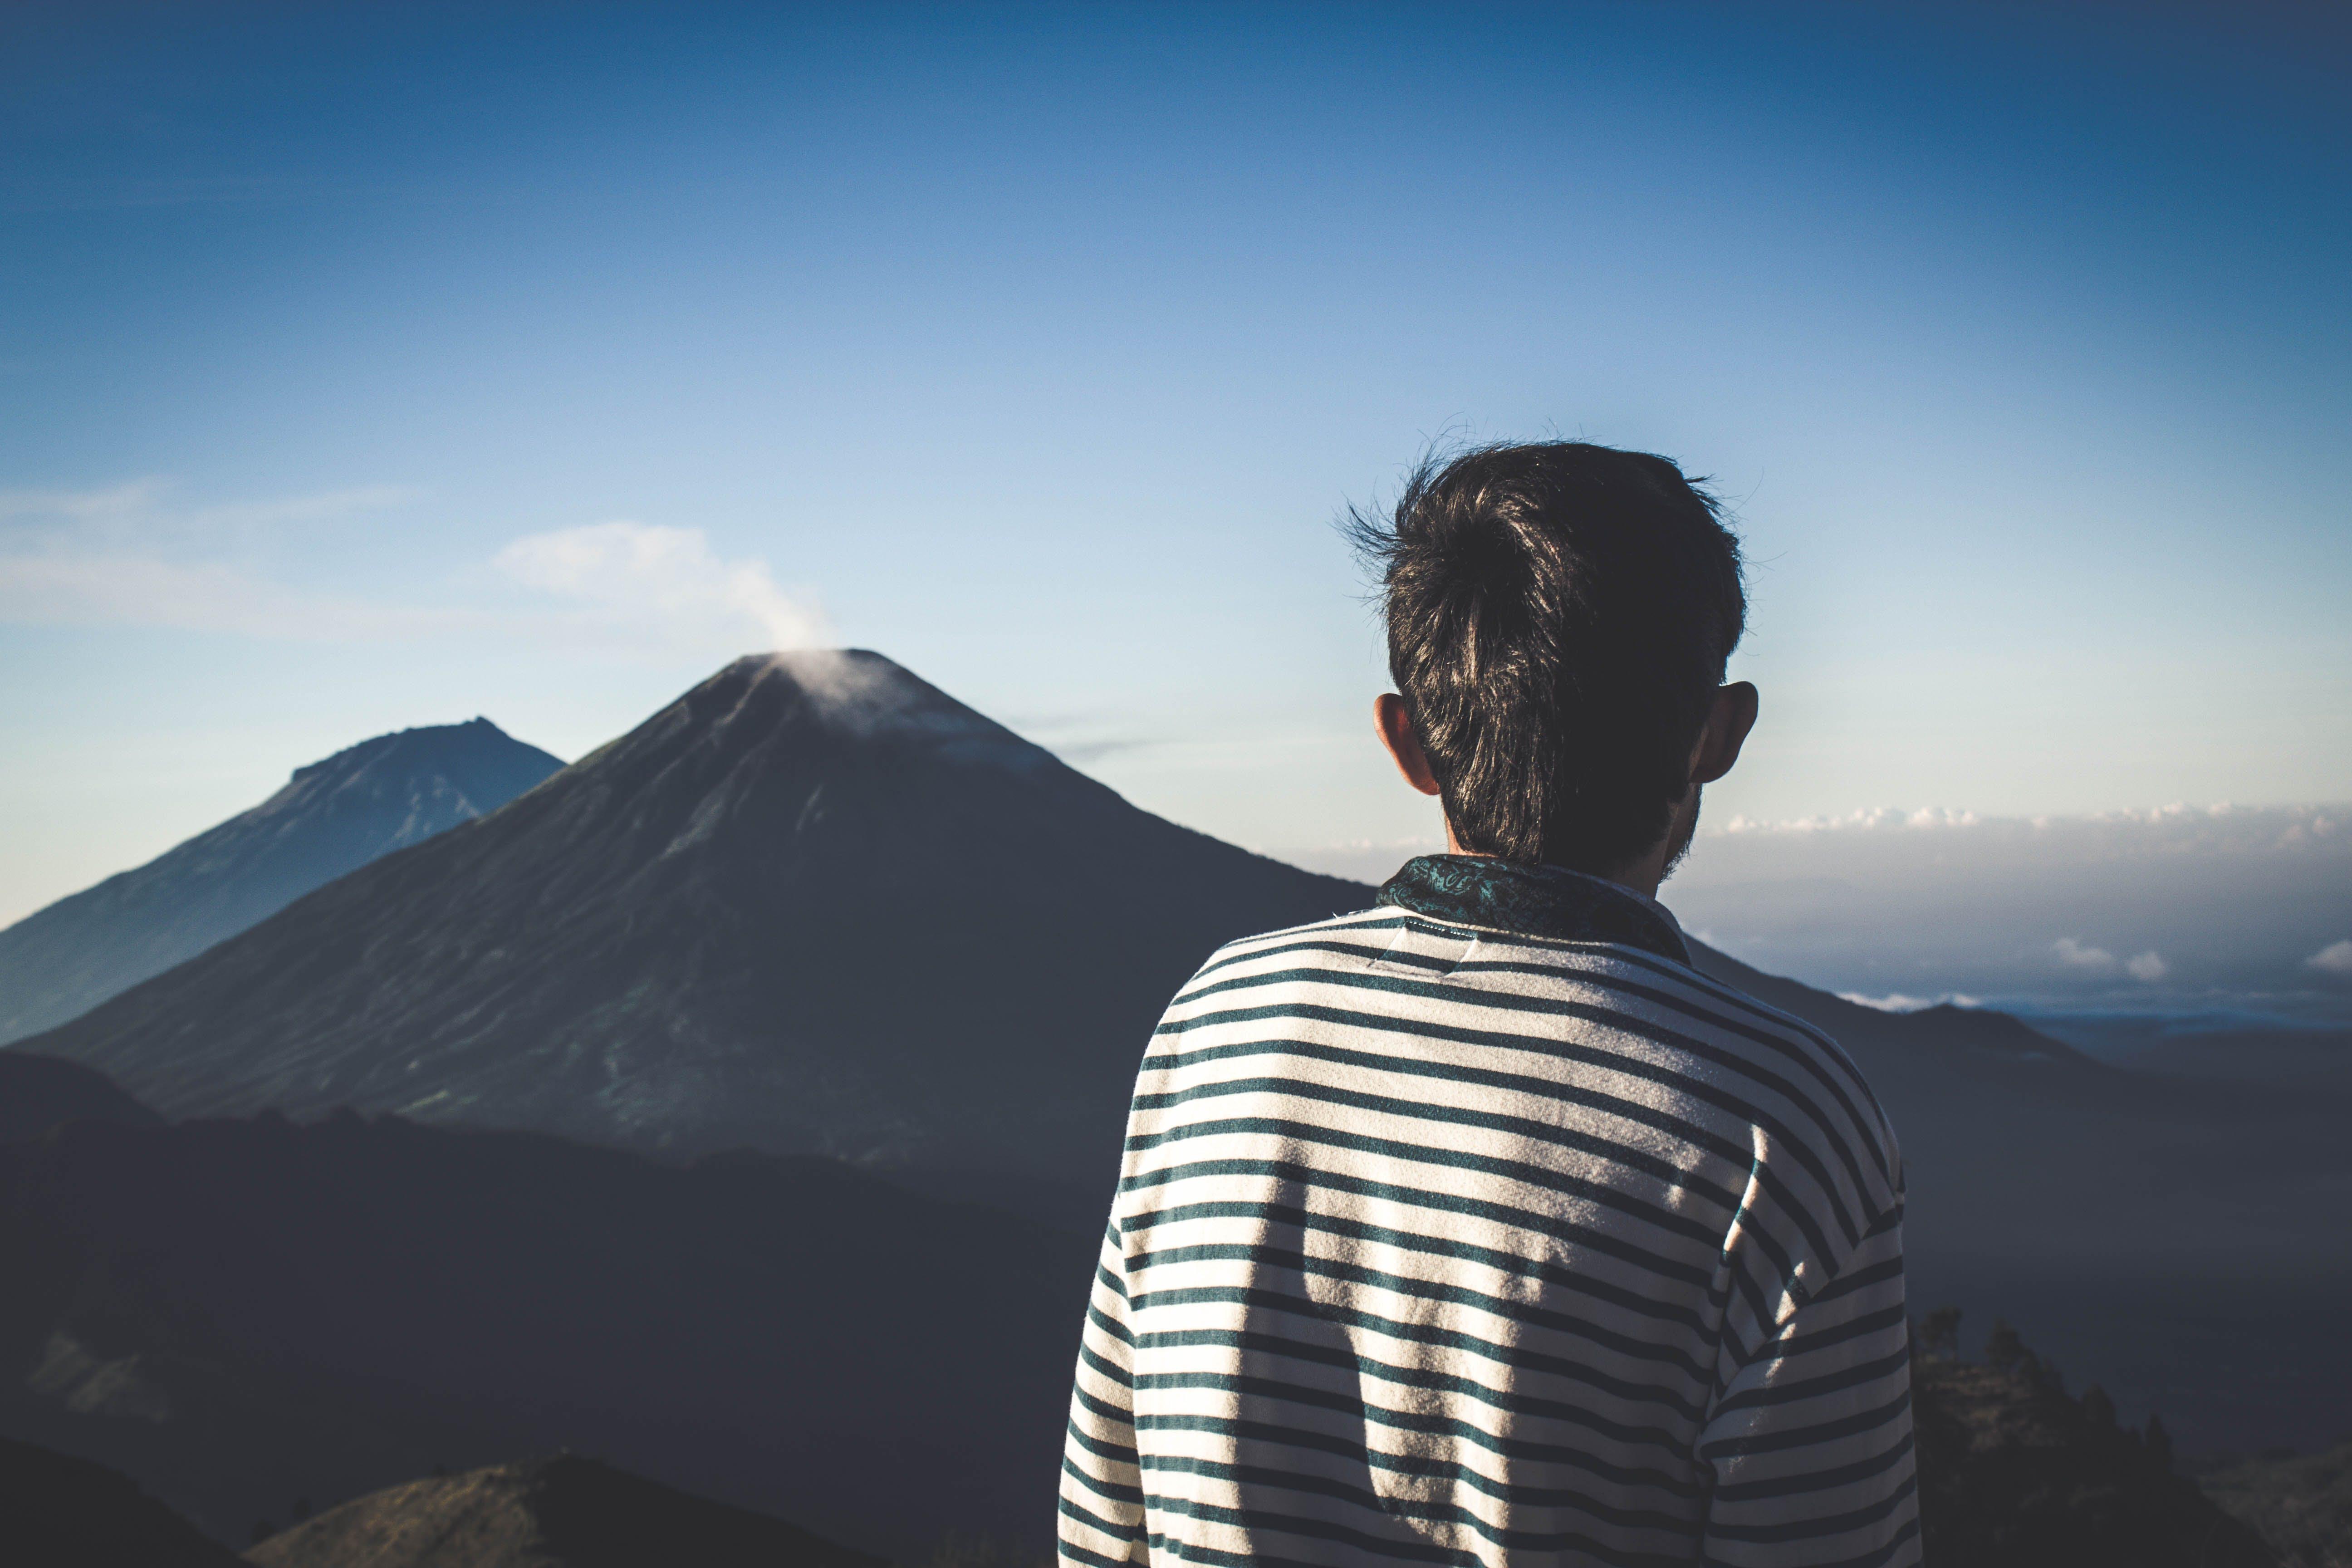 Man Wearing Striped Shirt Looking At Volcano